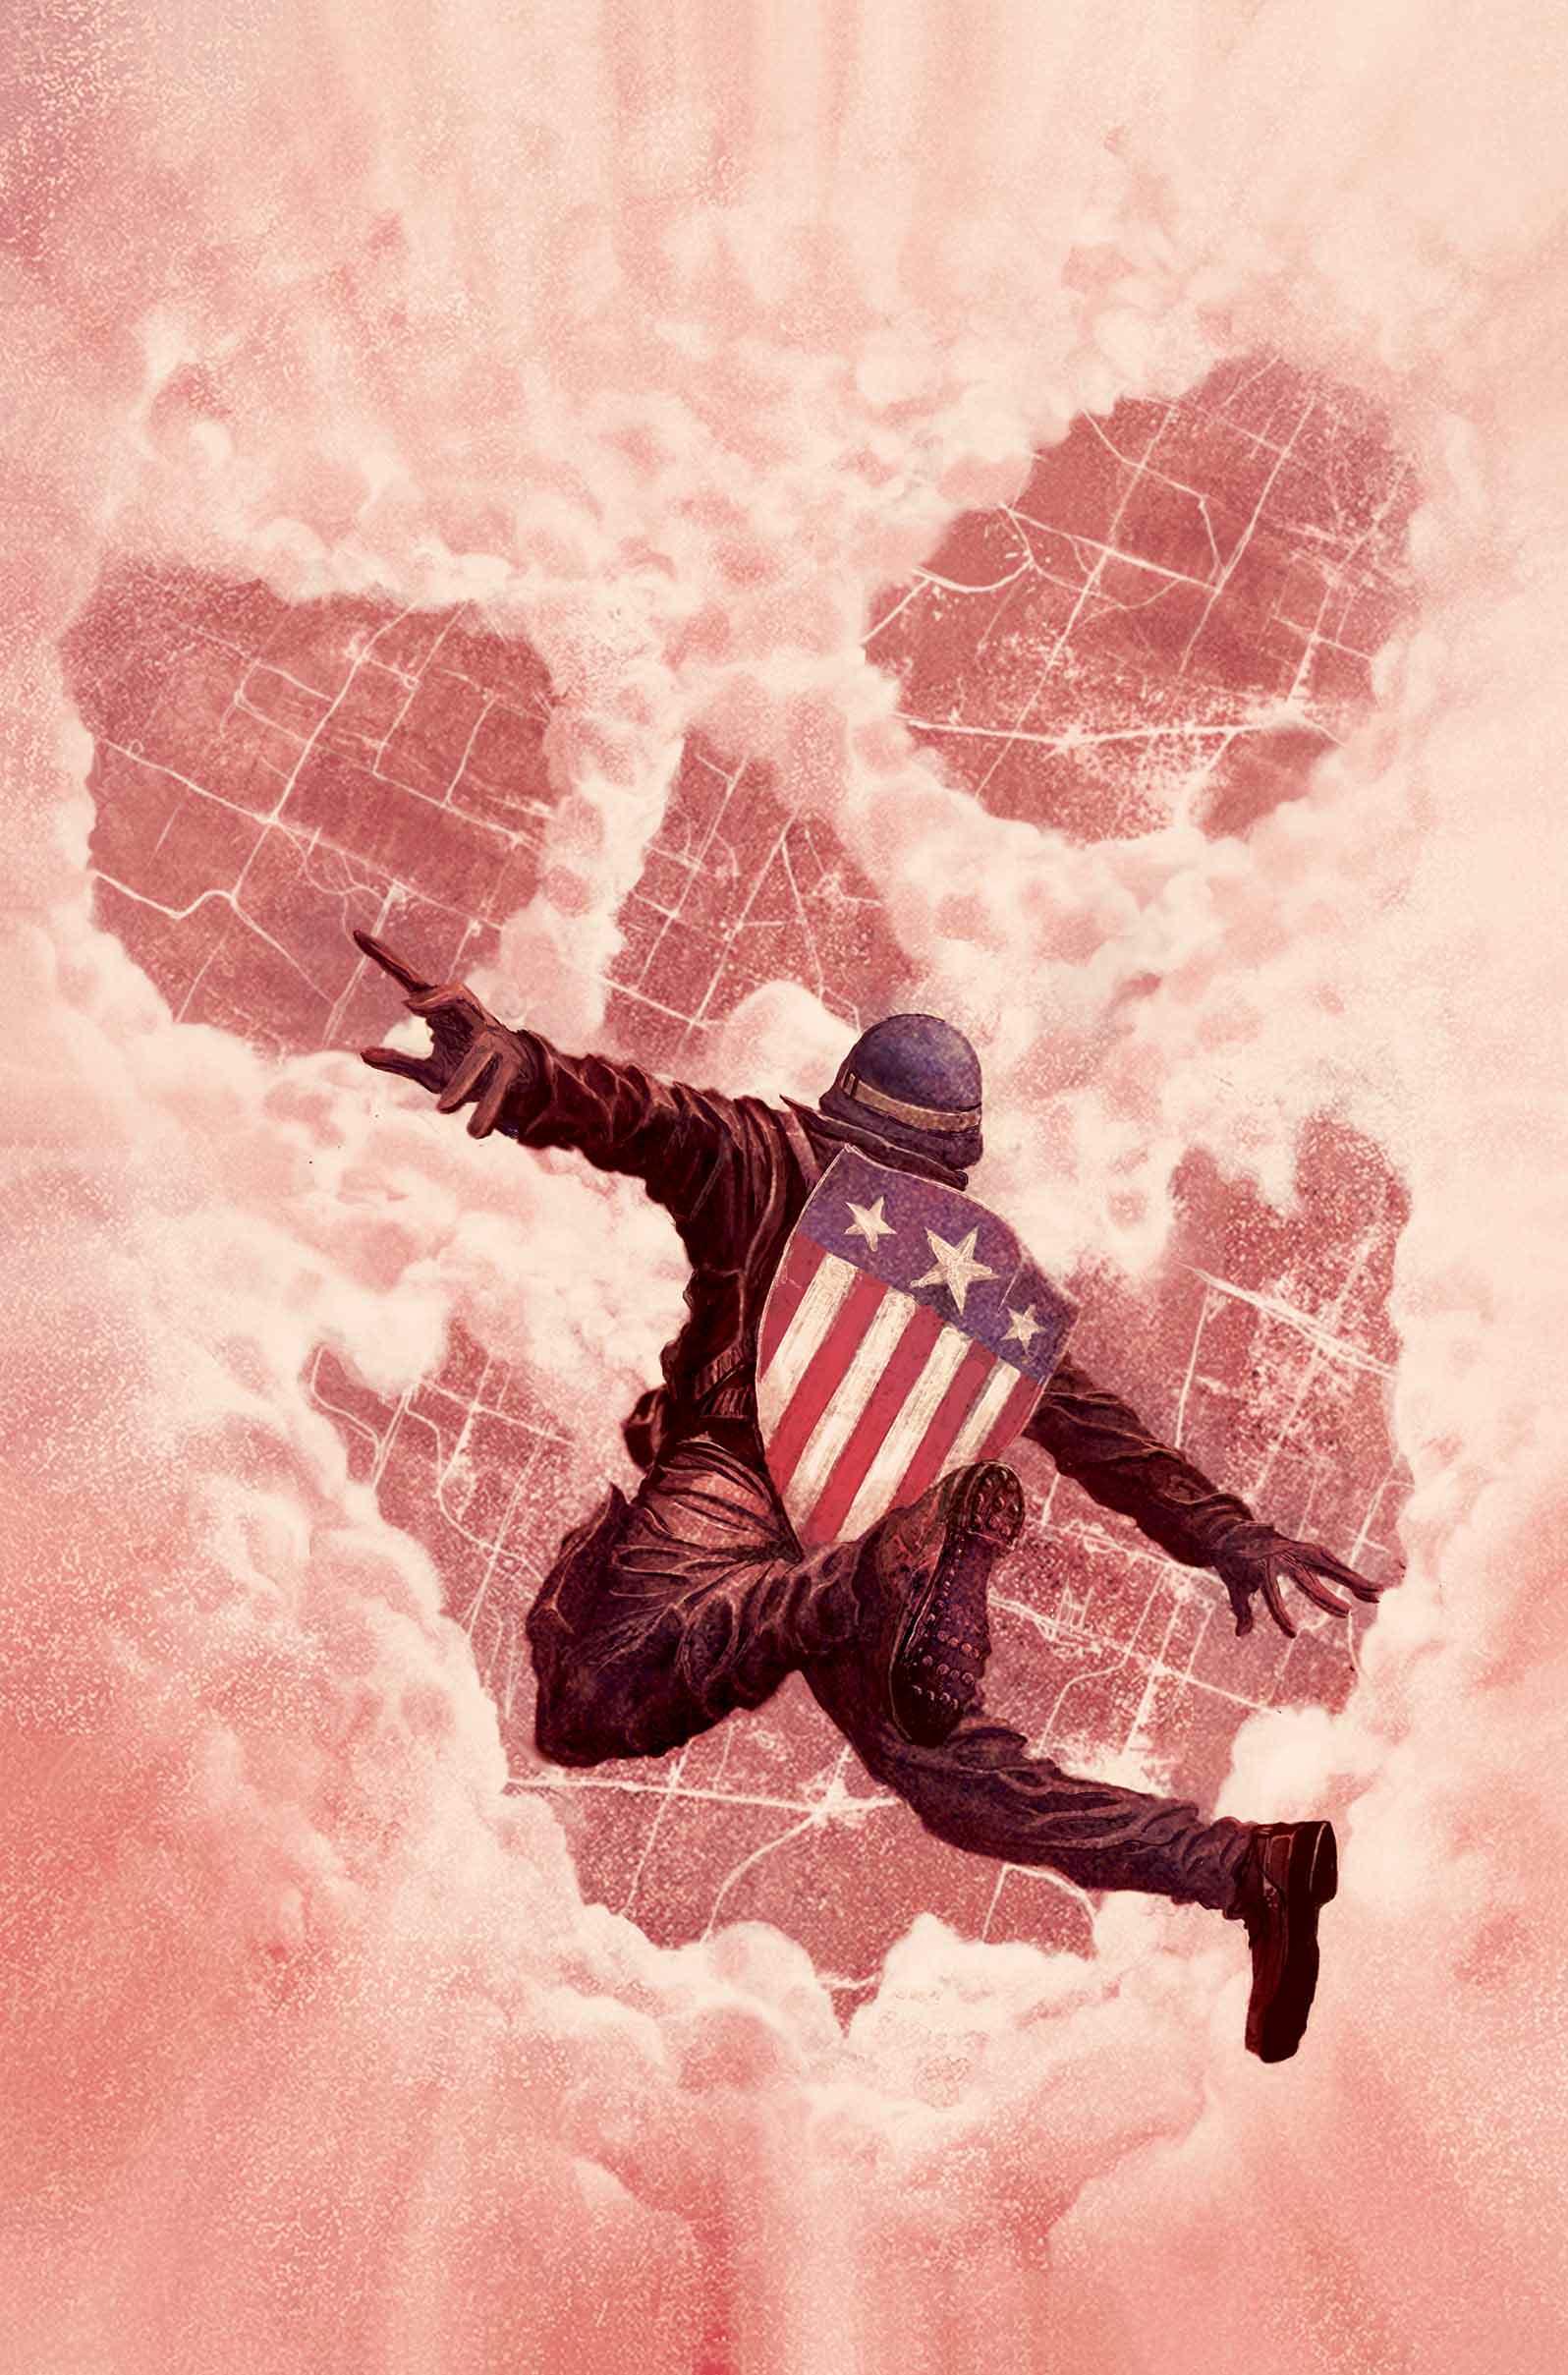 Mike Del Mundo comic book wallpapers 2 (1)